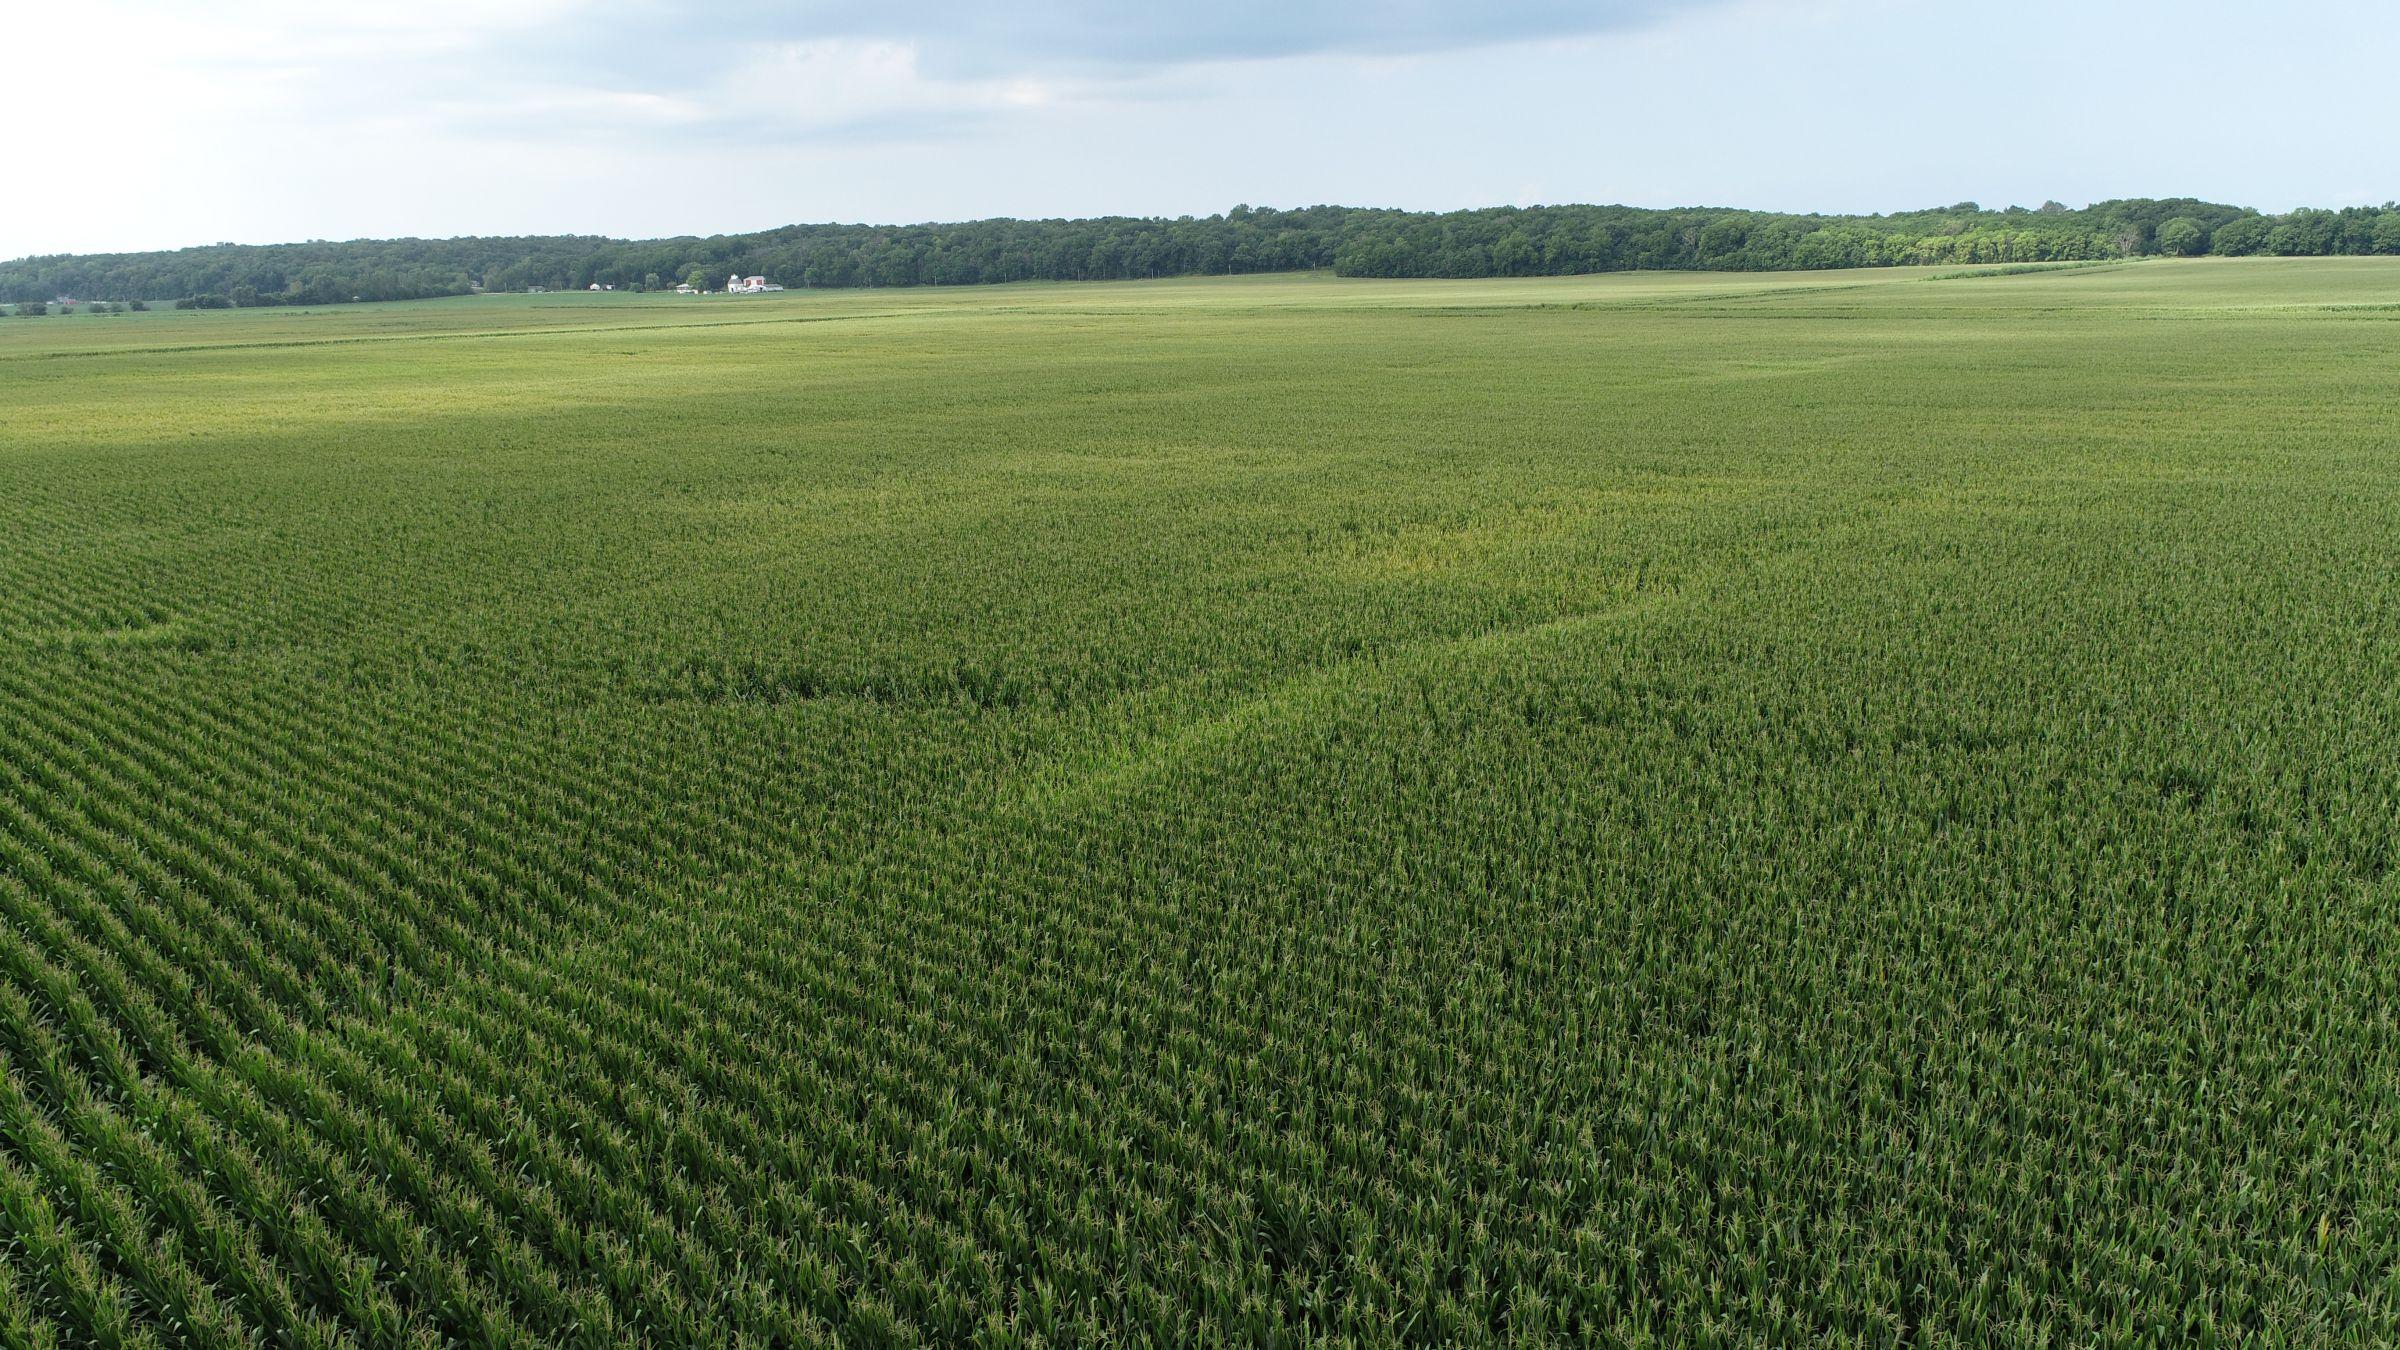 land-whiteside-county-illinois-146-acres-listing-number-15705-0-2021-08-27-180420.JPG